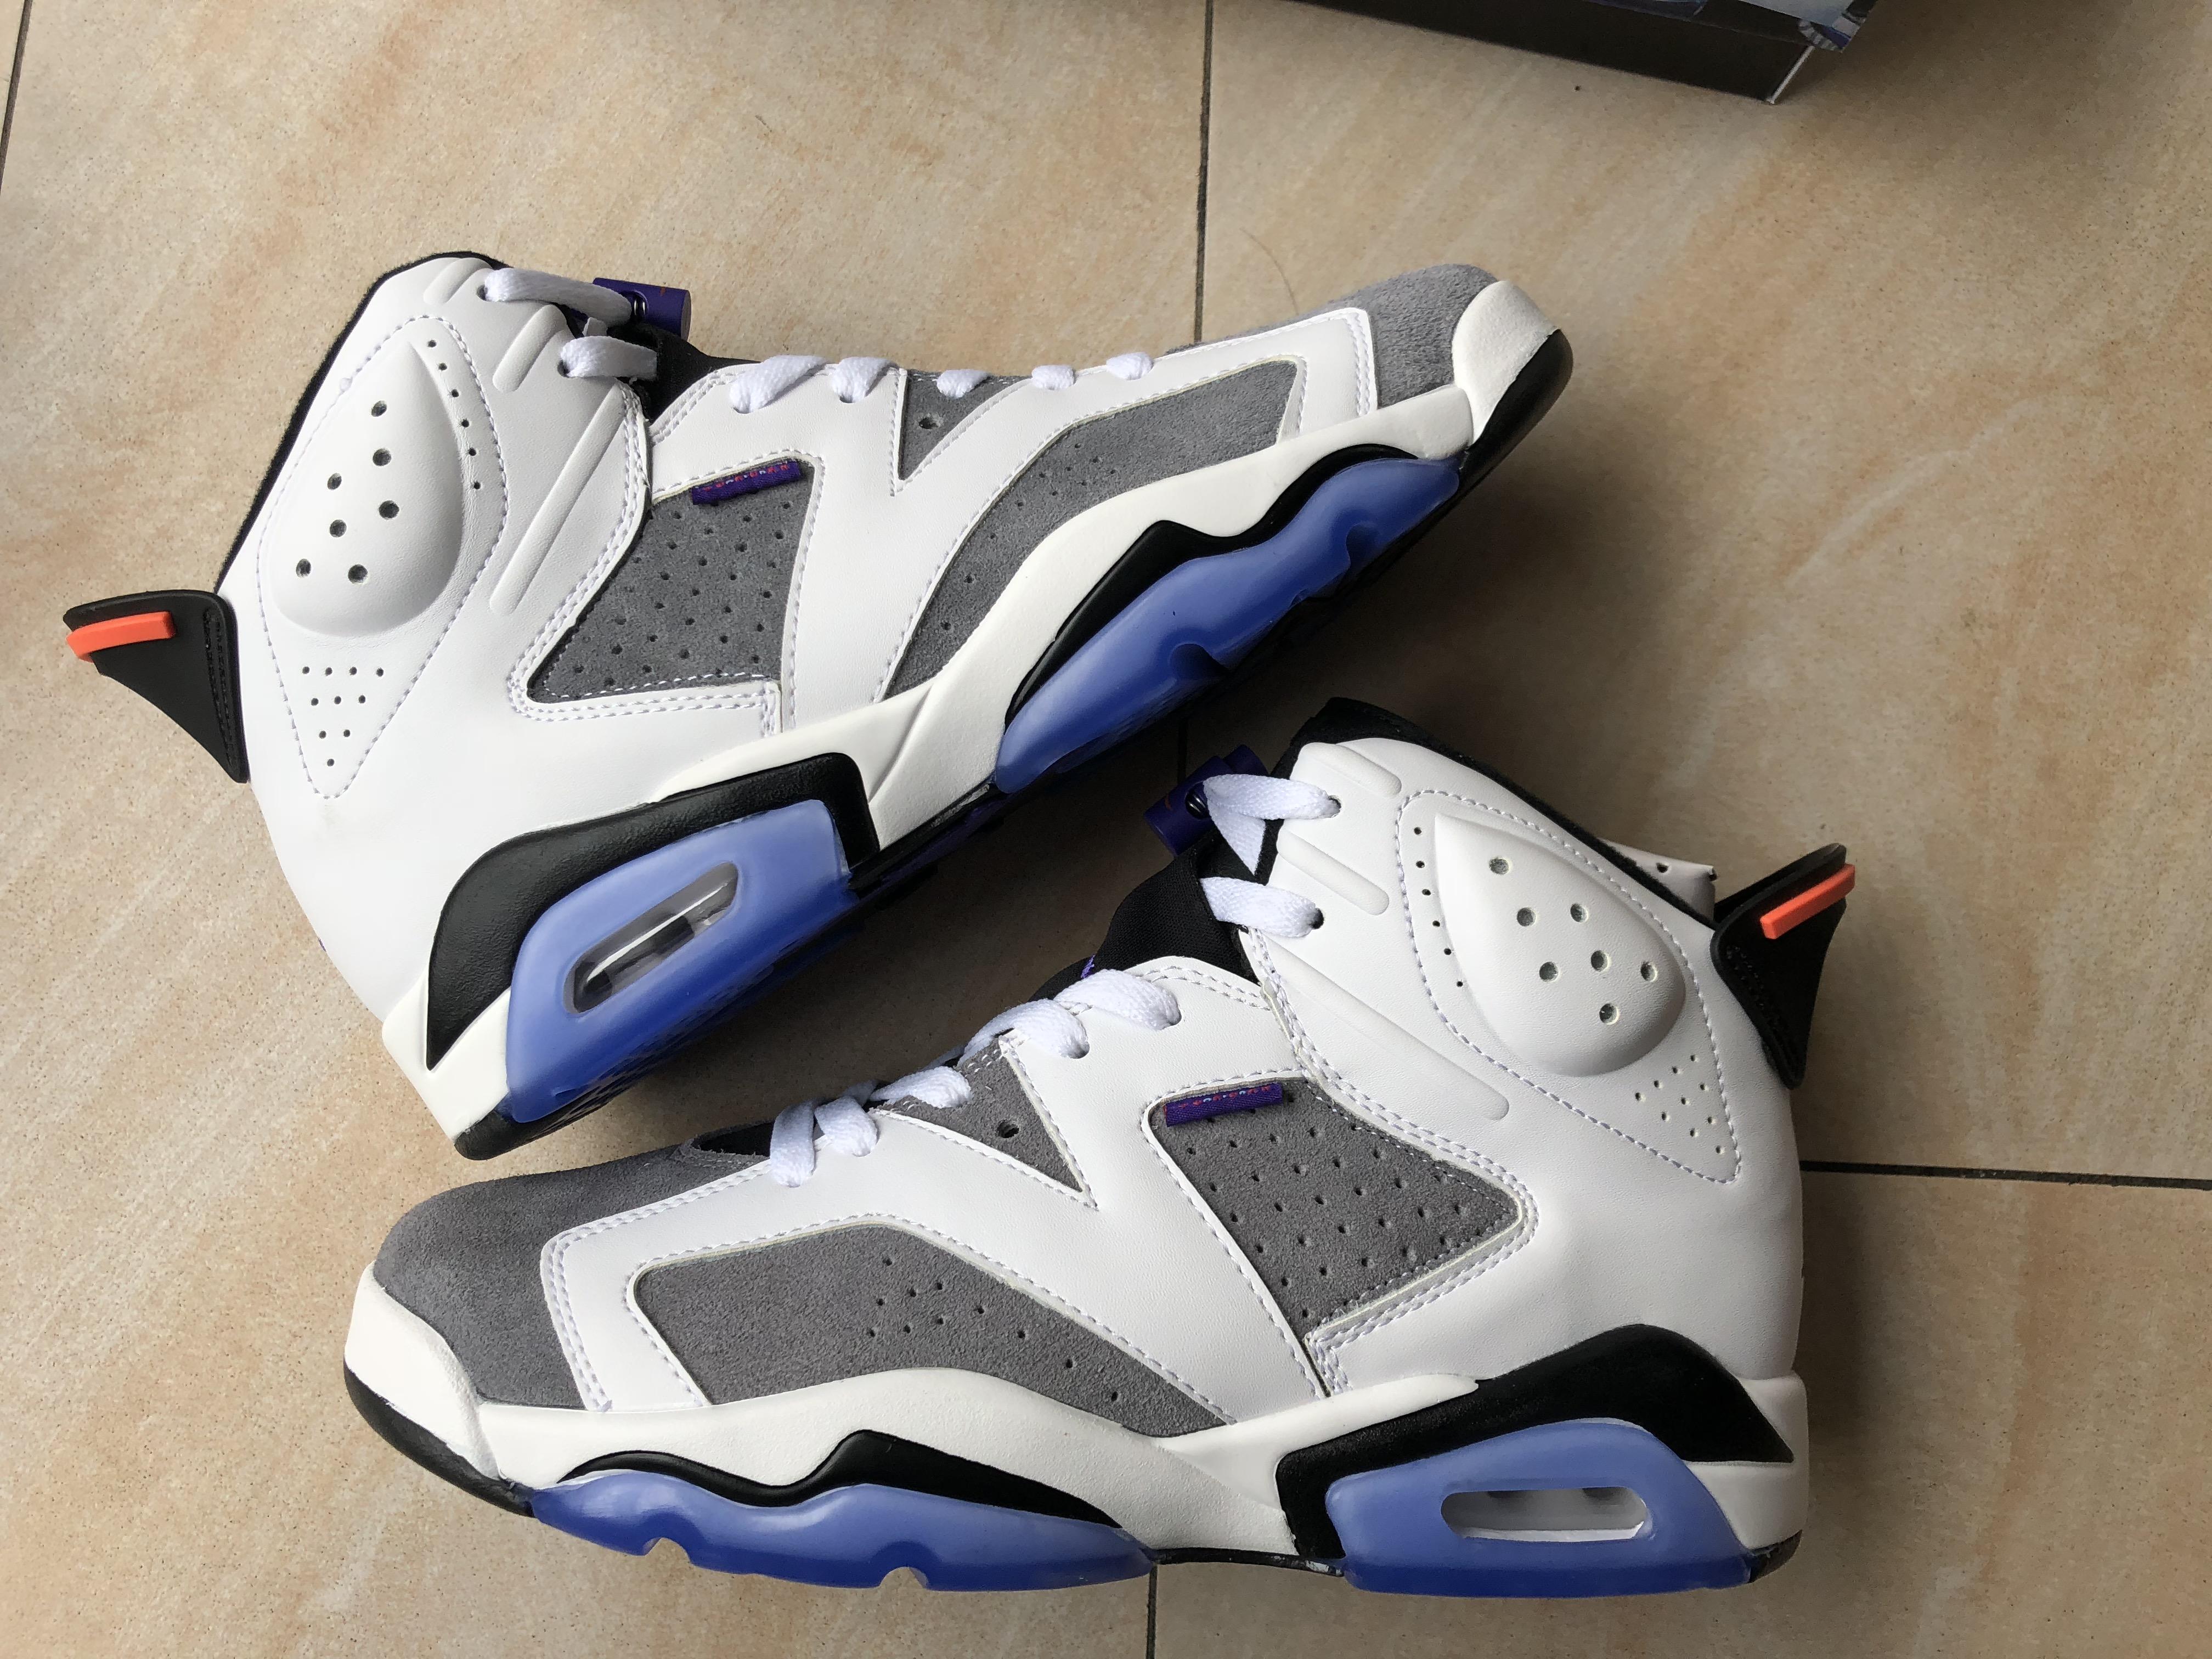 ca959b8eb836 Men Air Jordan 6 FIint White Grey Black Blue Sole Shoes ...